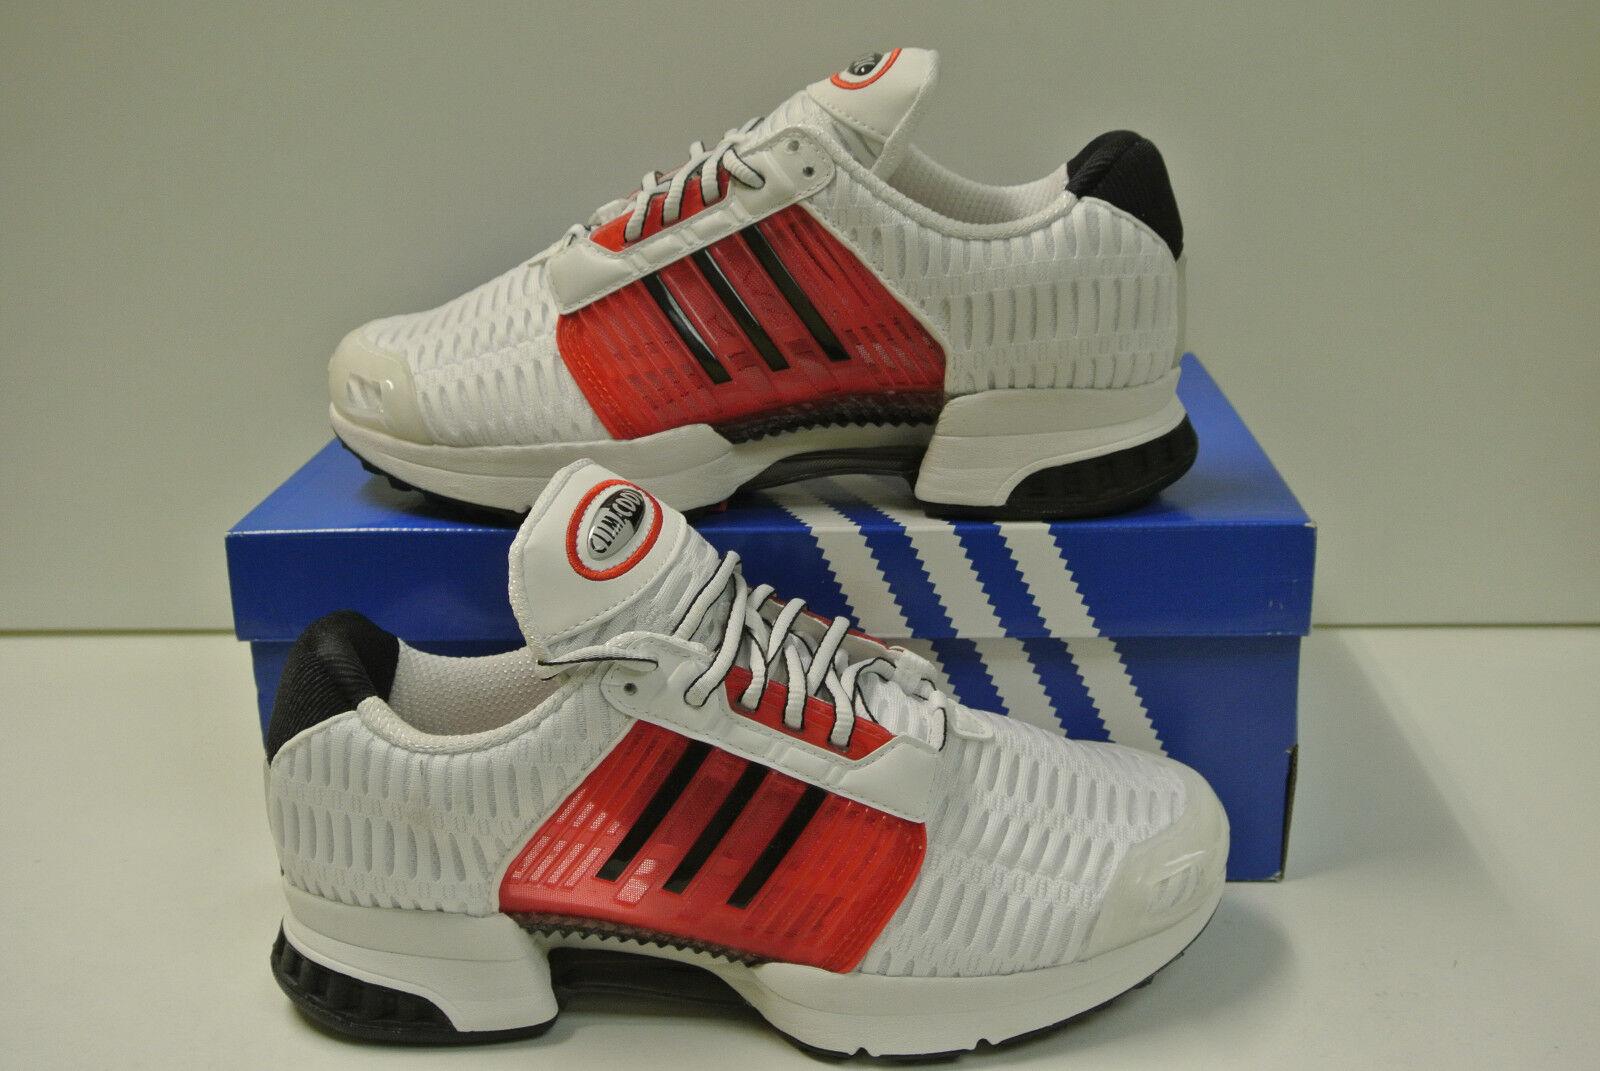 Adidas  Clima Cool 1 Gr. wählbar  Adidas Neu & OVP BB0667 43c7d5